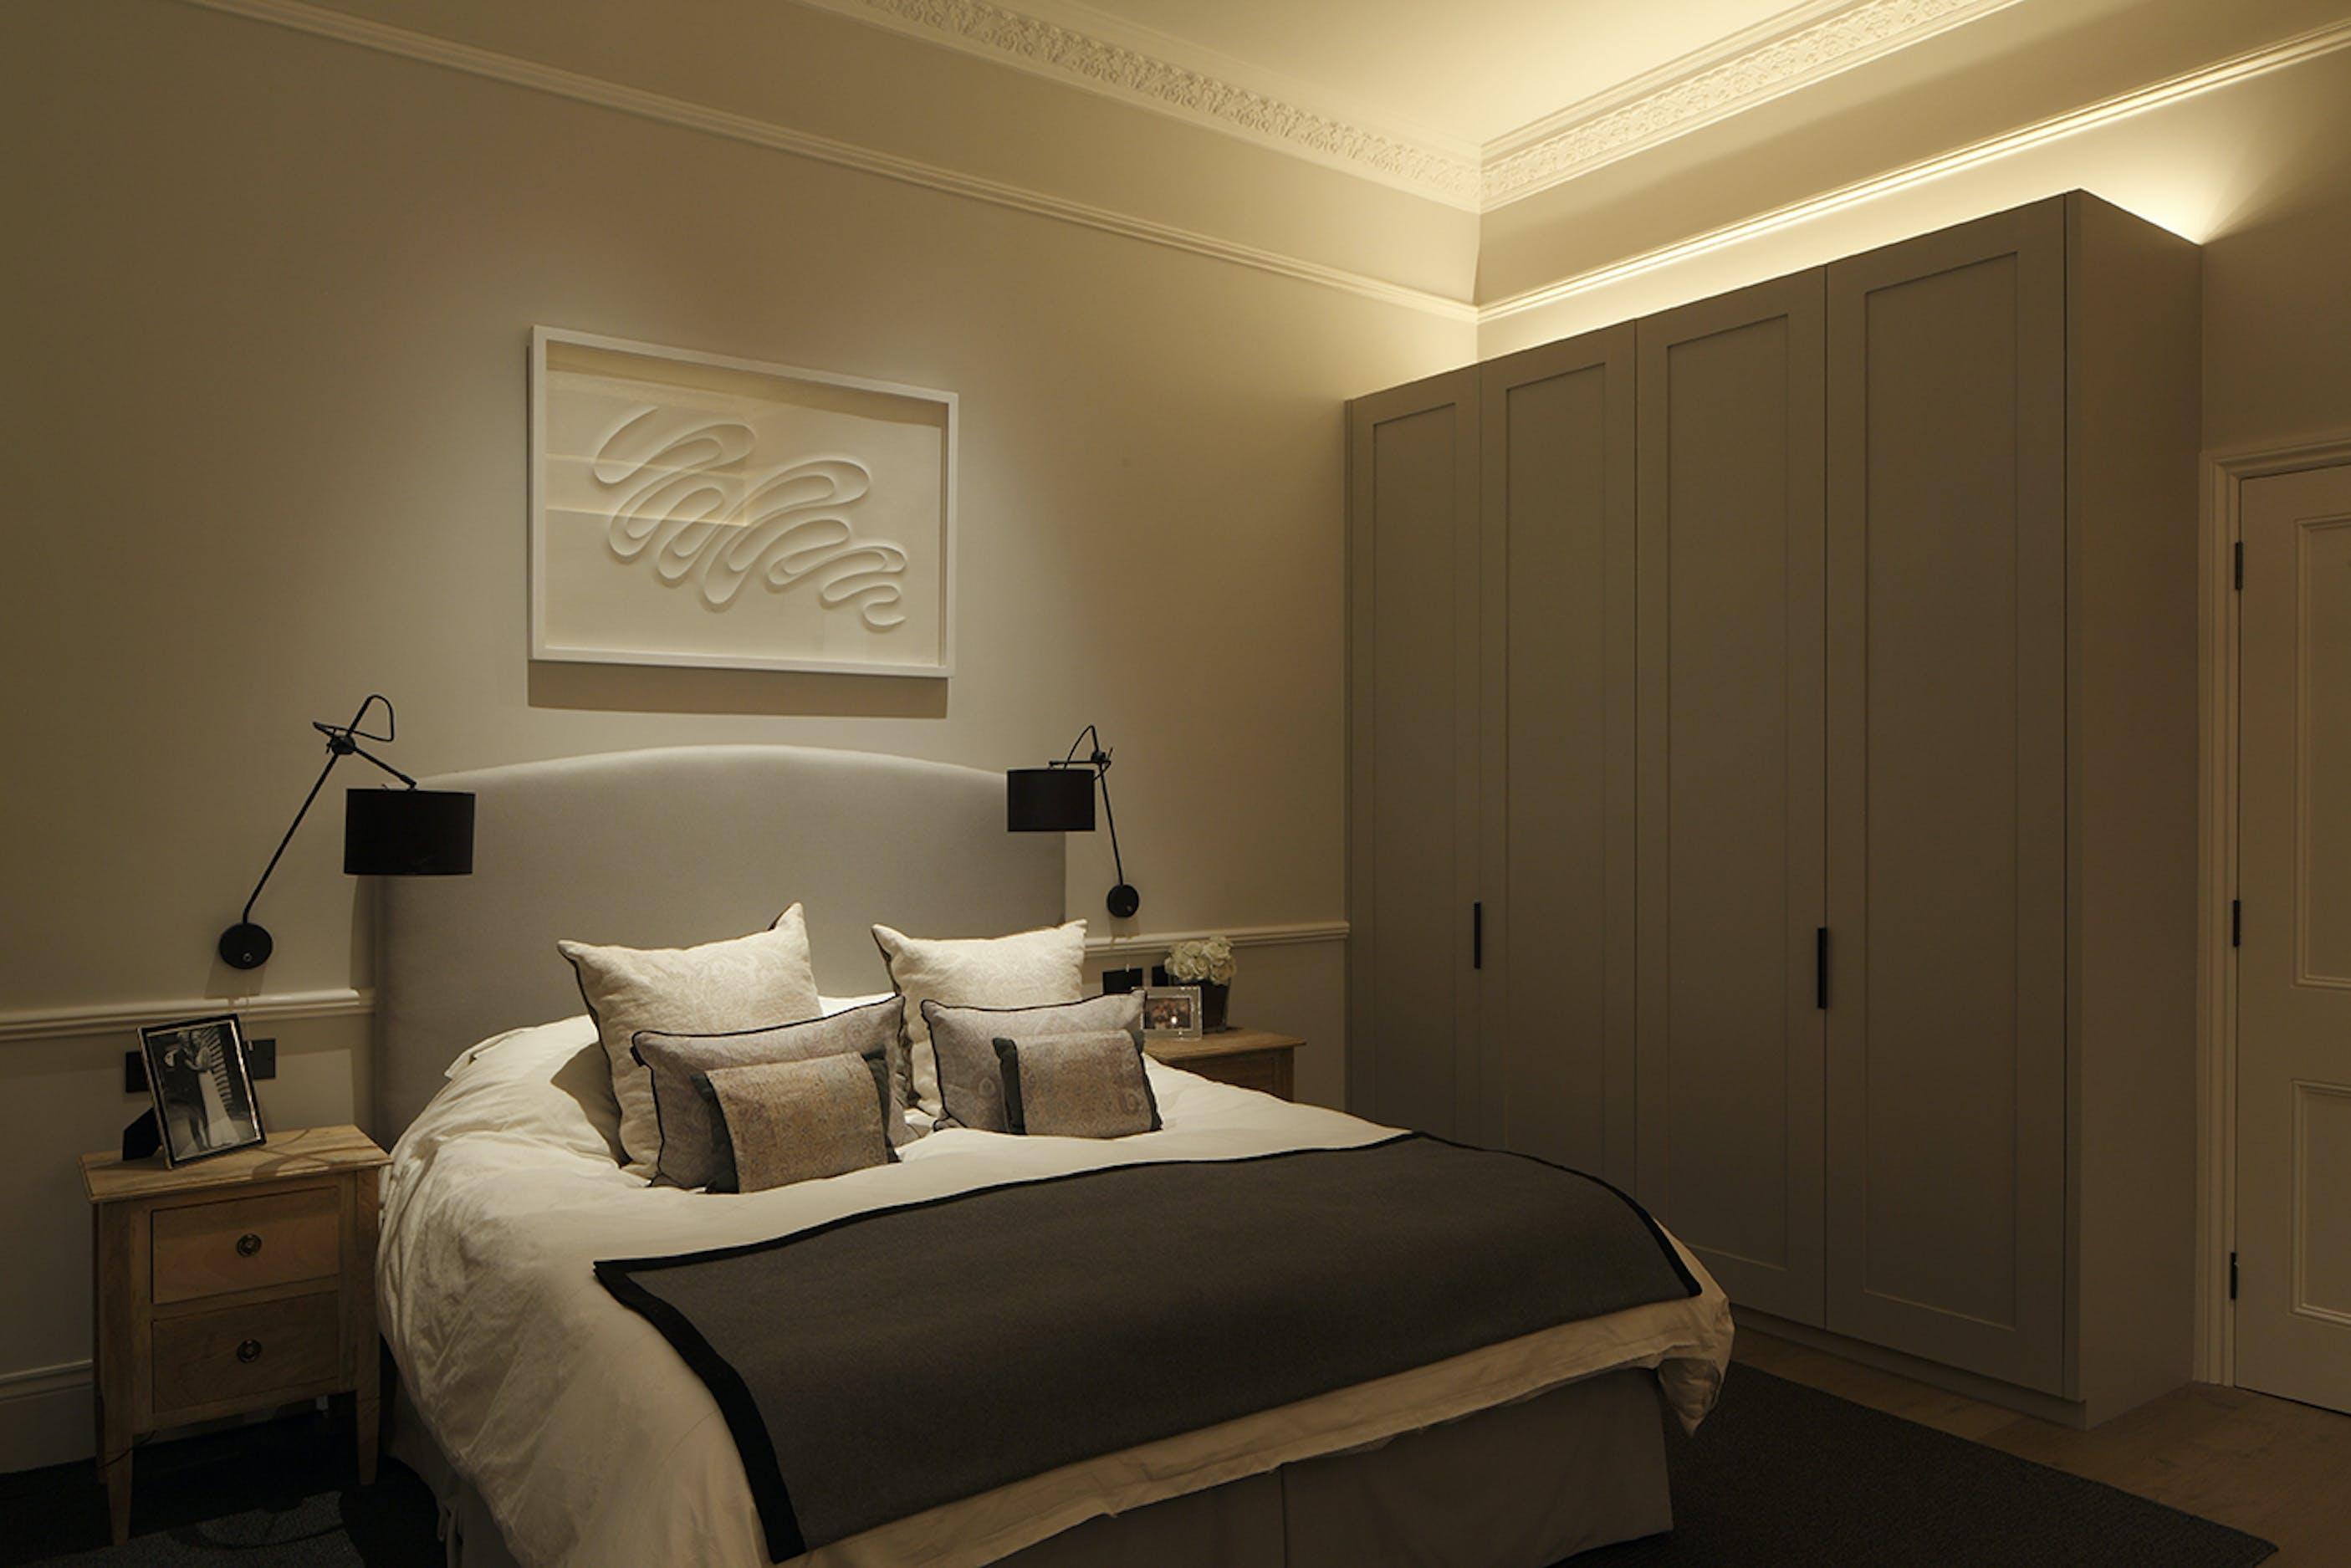 high ceilinged bedroom lighting